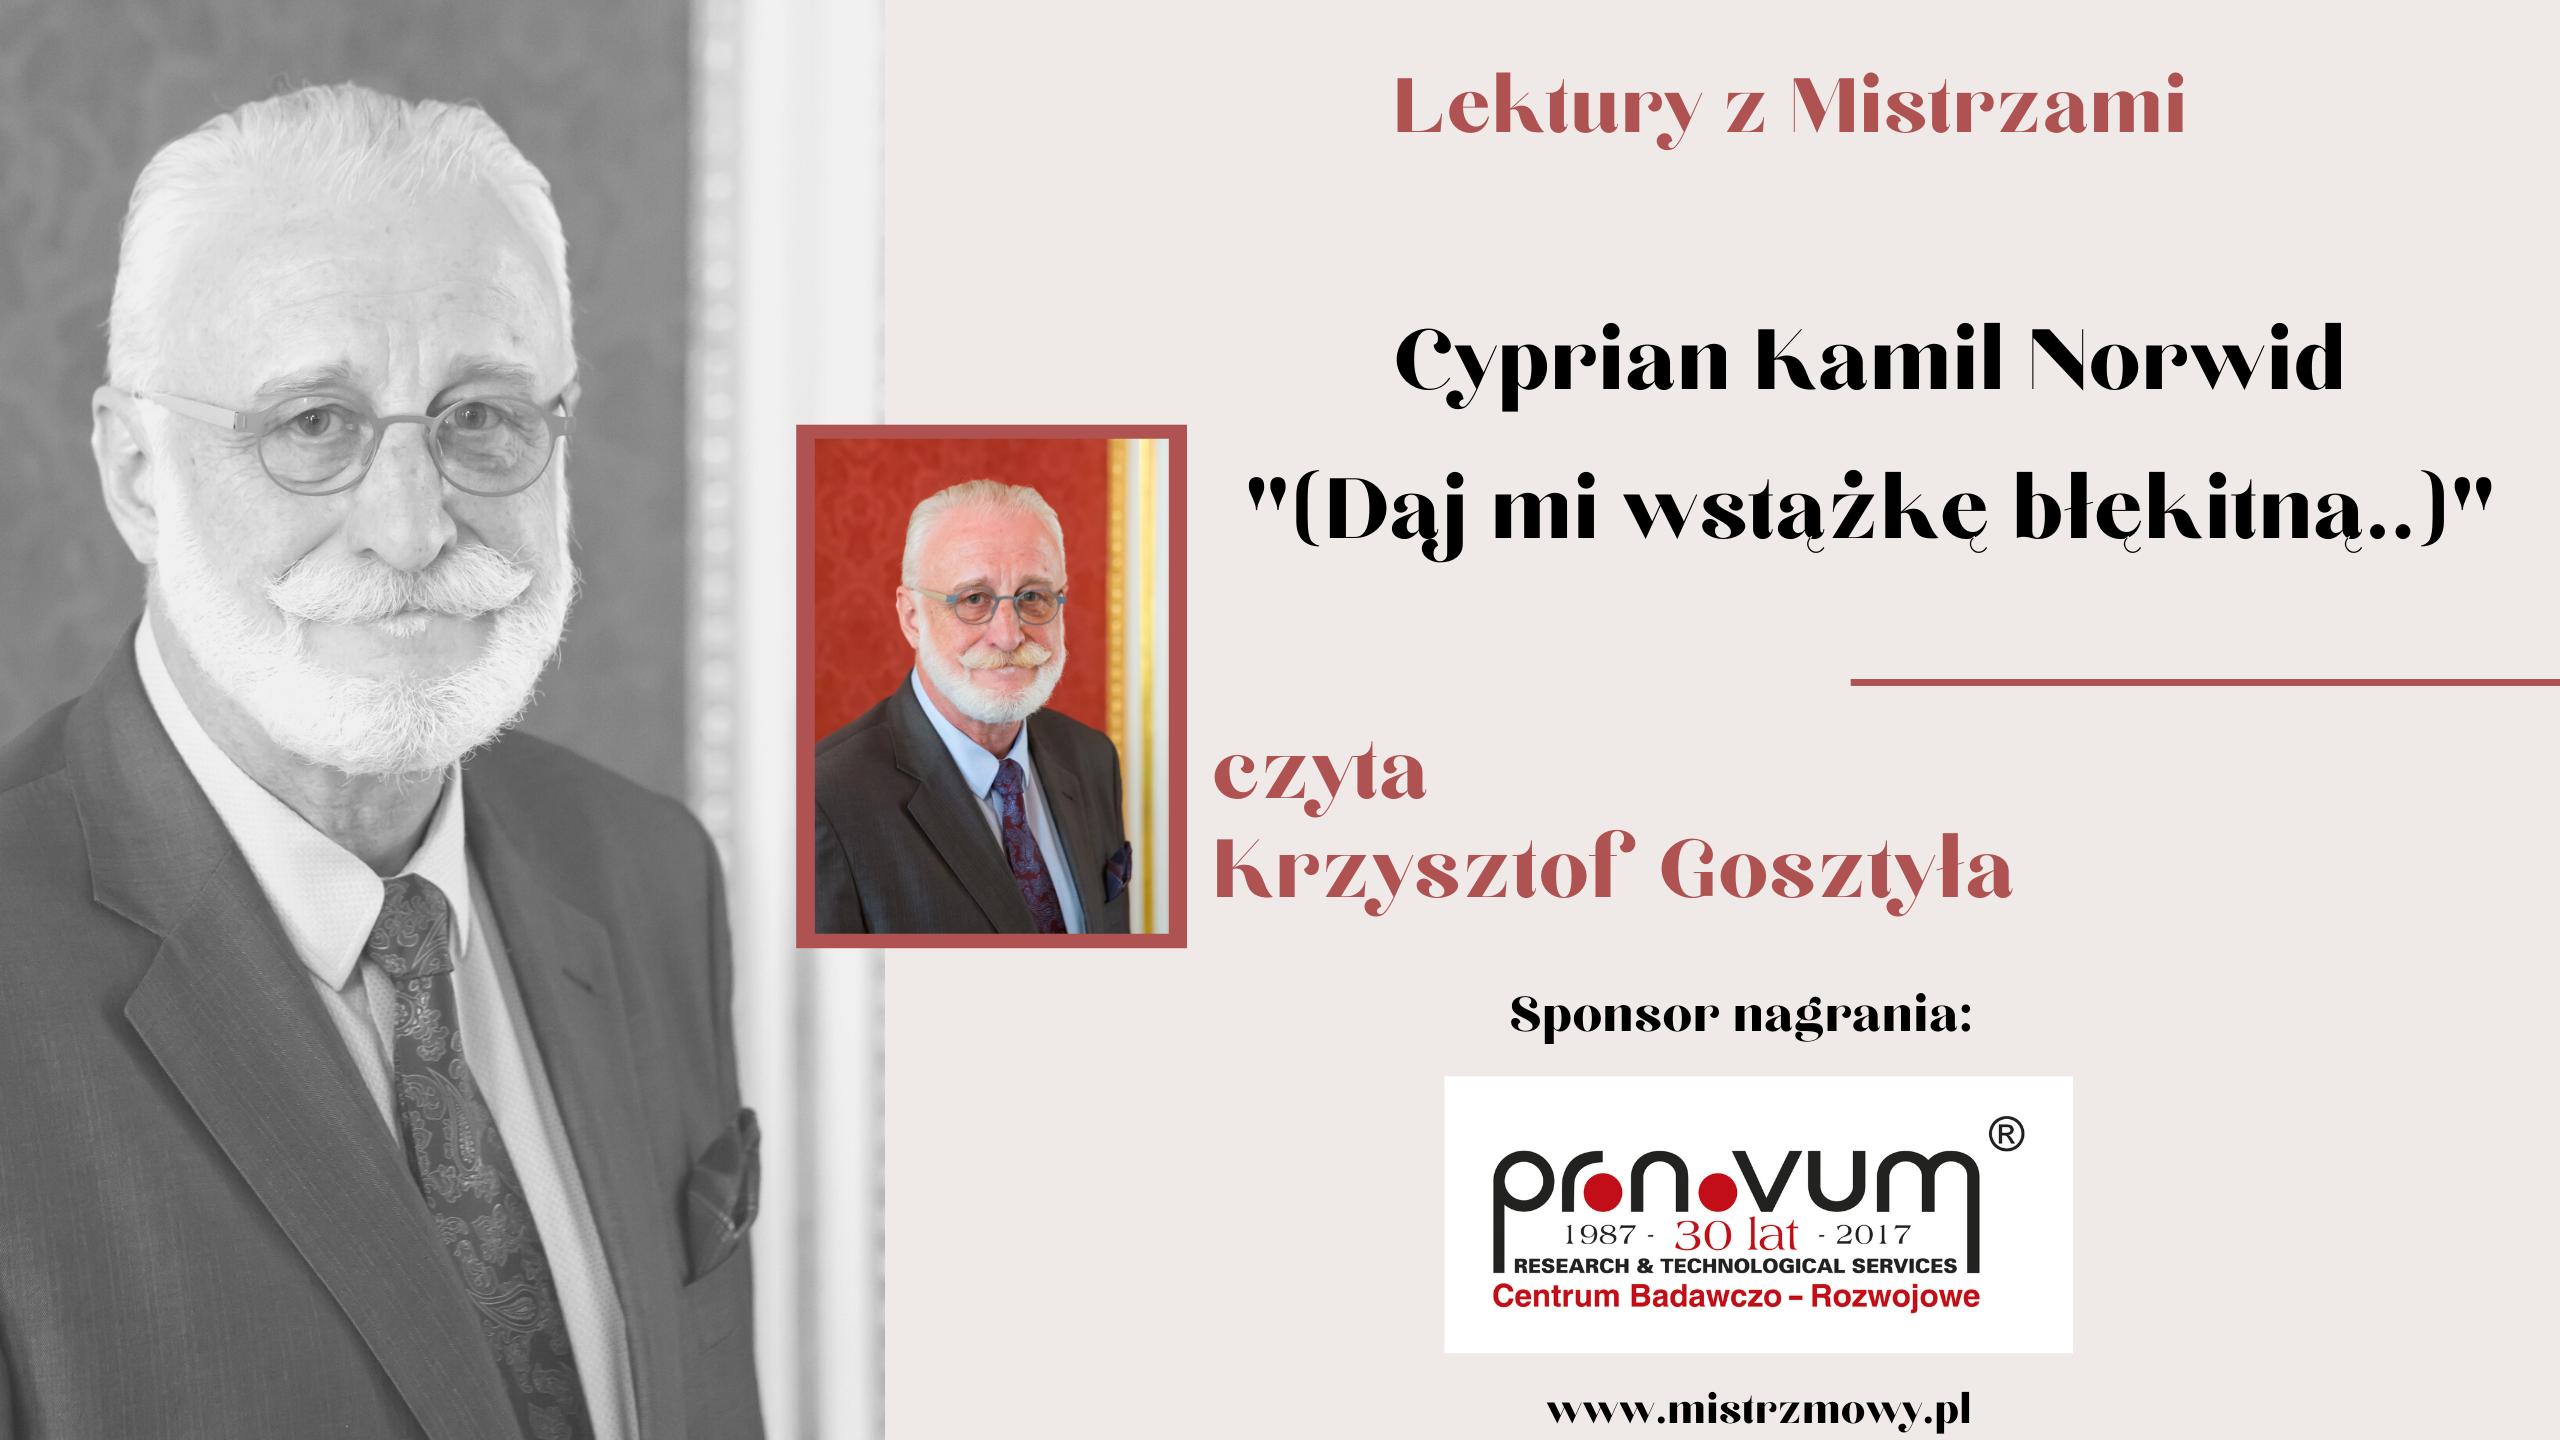 Cyprian Kamil Norwid - Daj mi wstazke blekitna